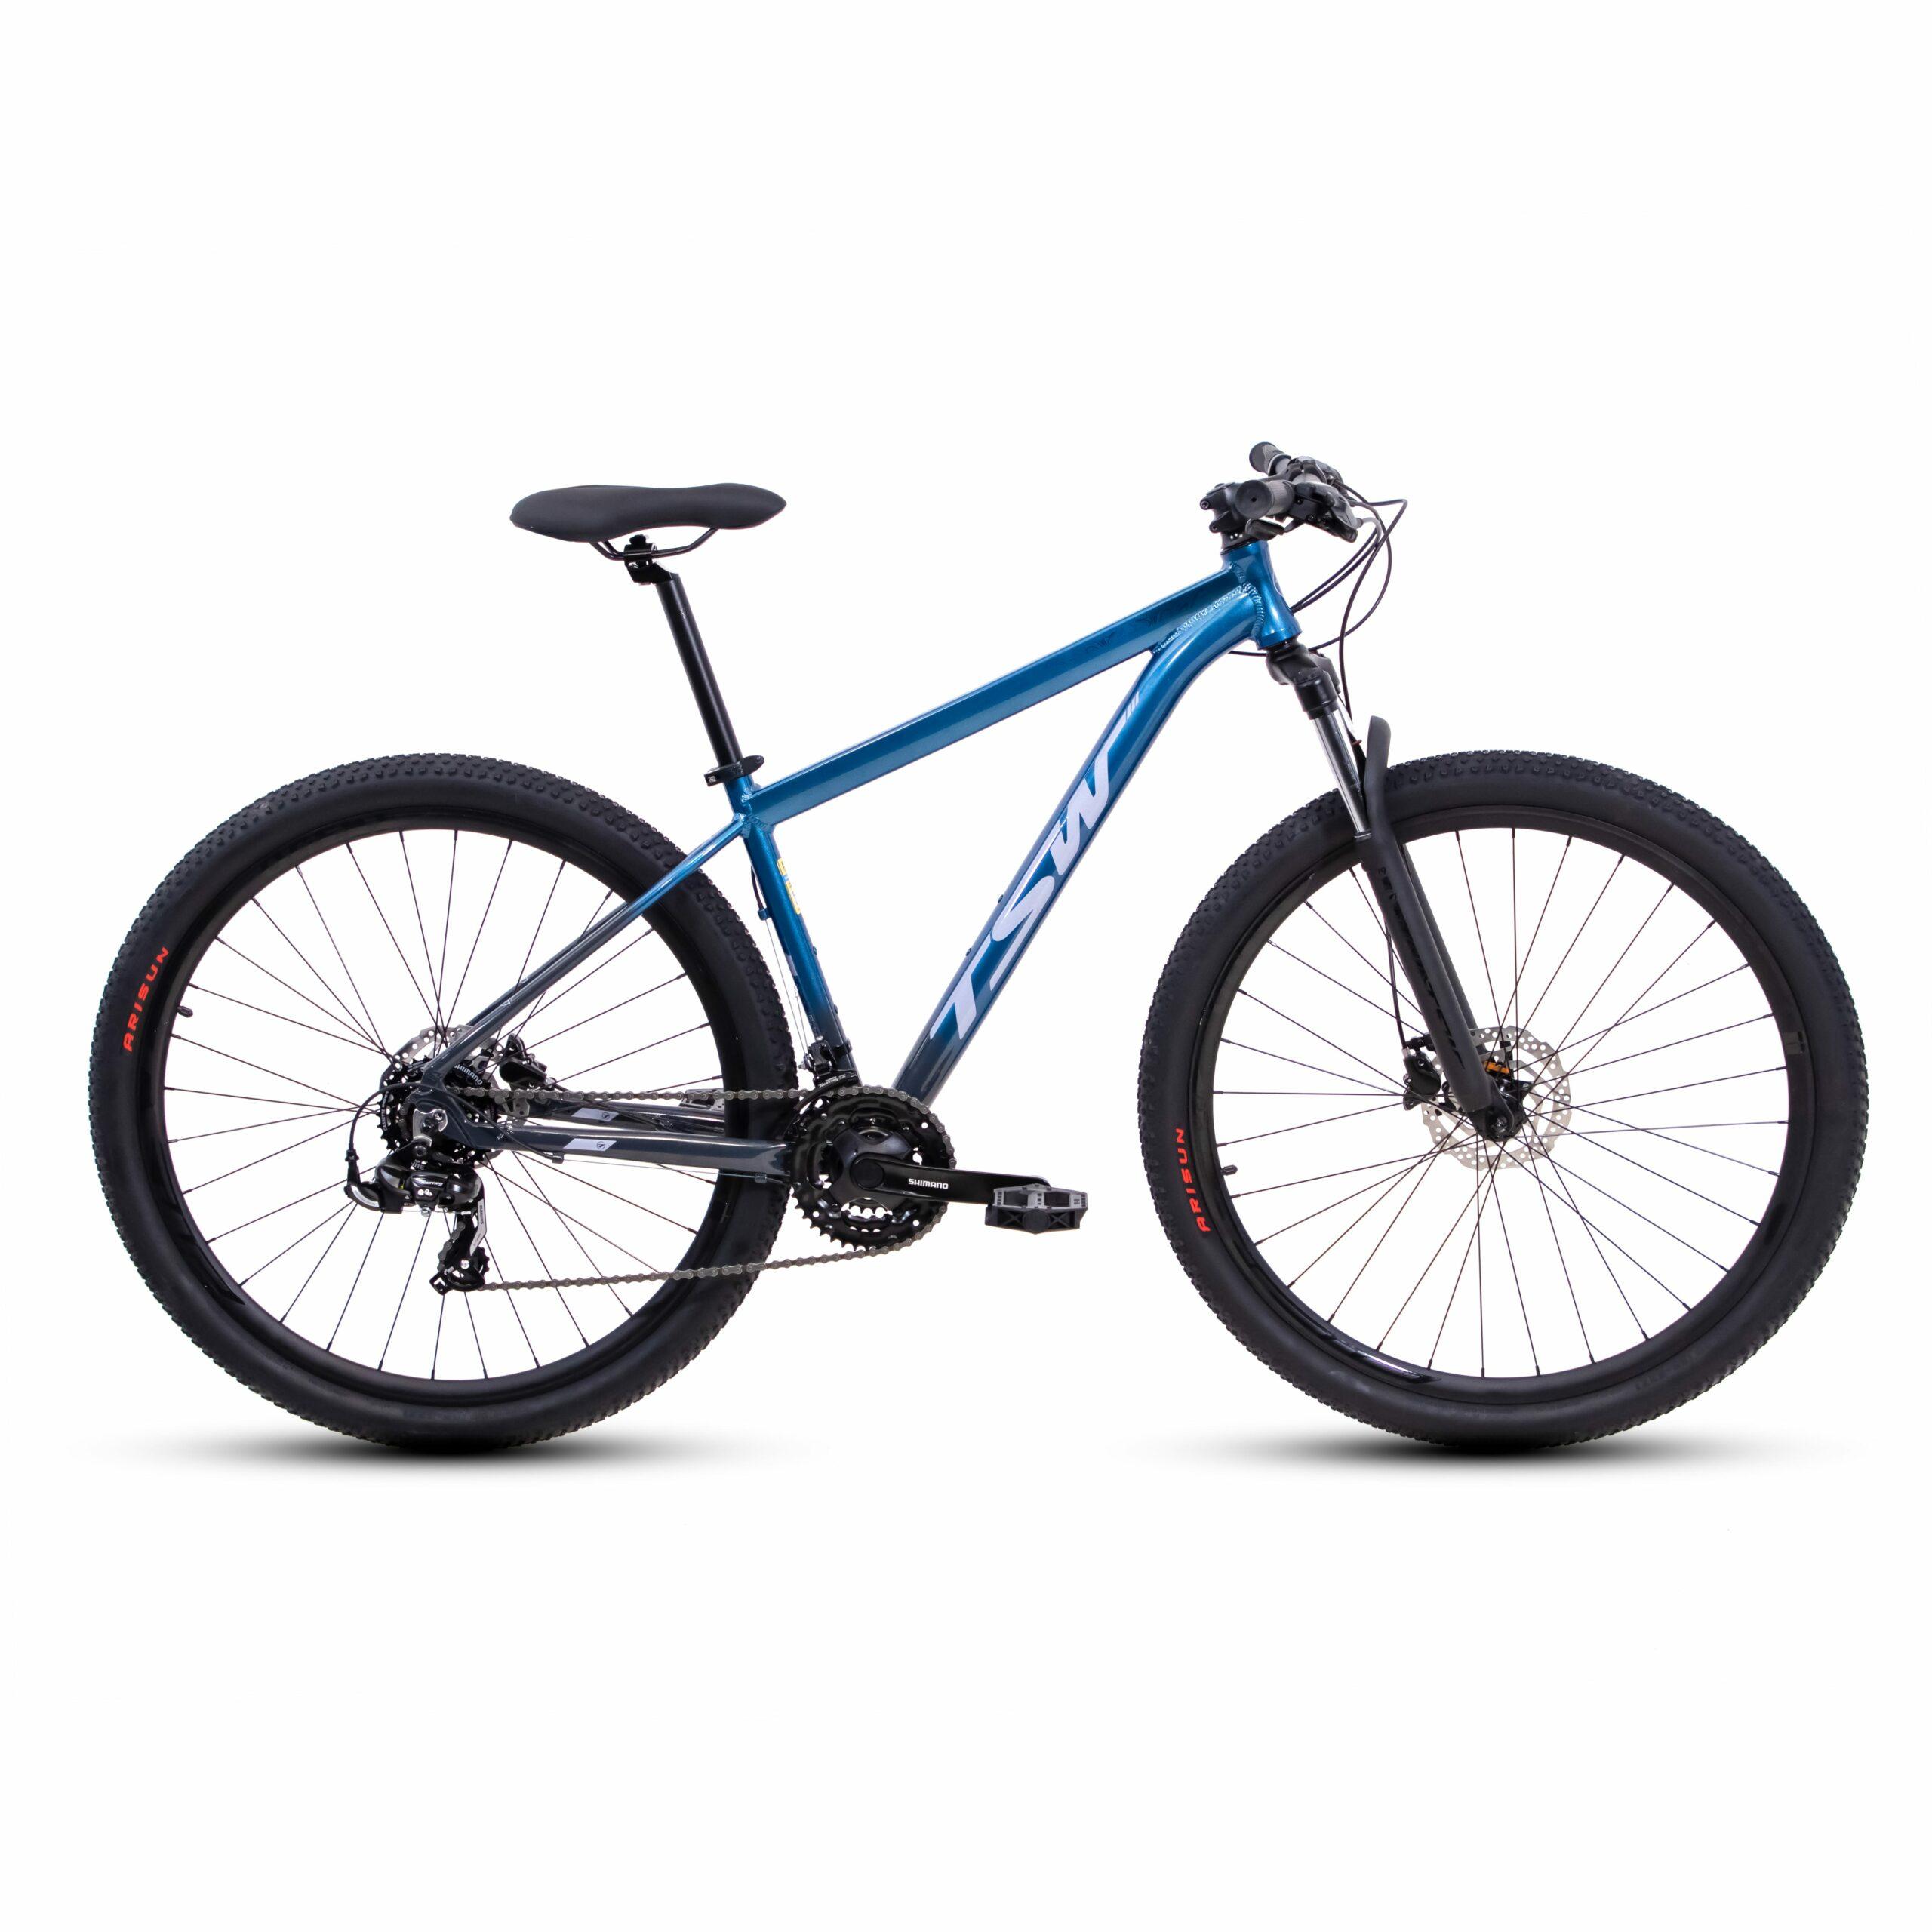 Bicicleta TSW Ride Plus 14